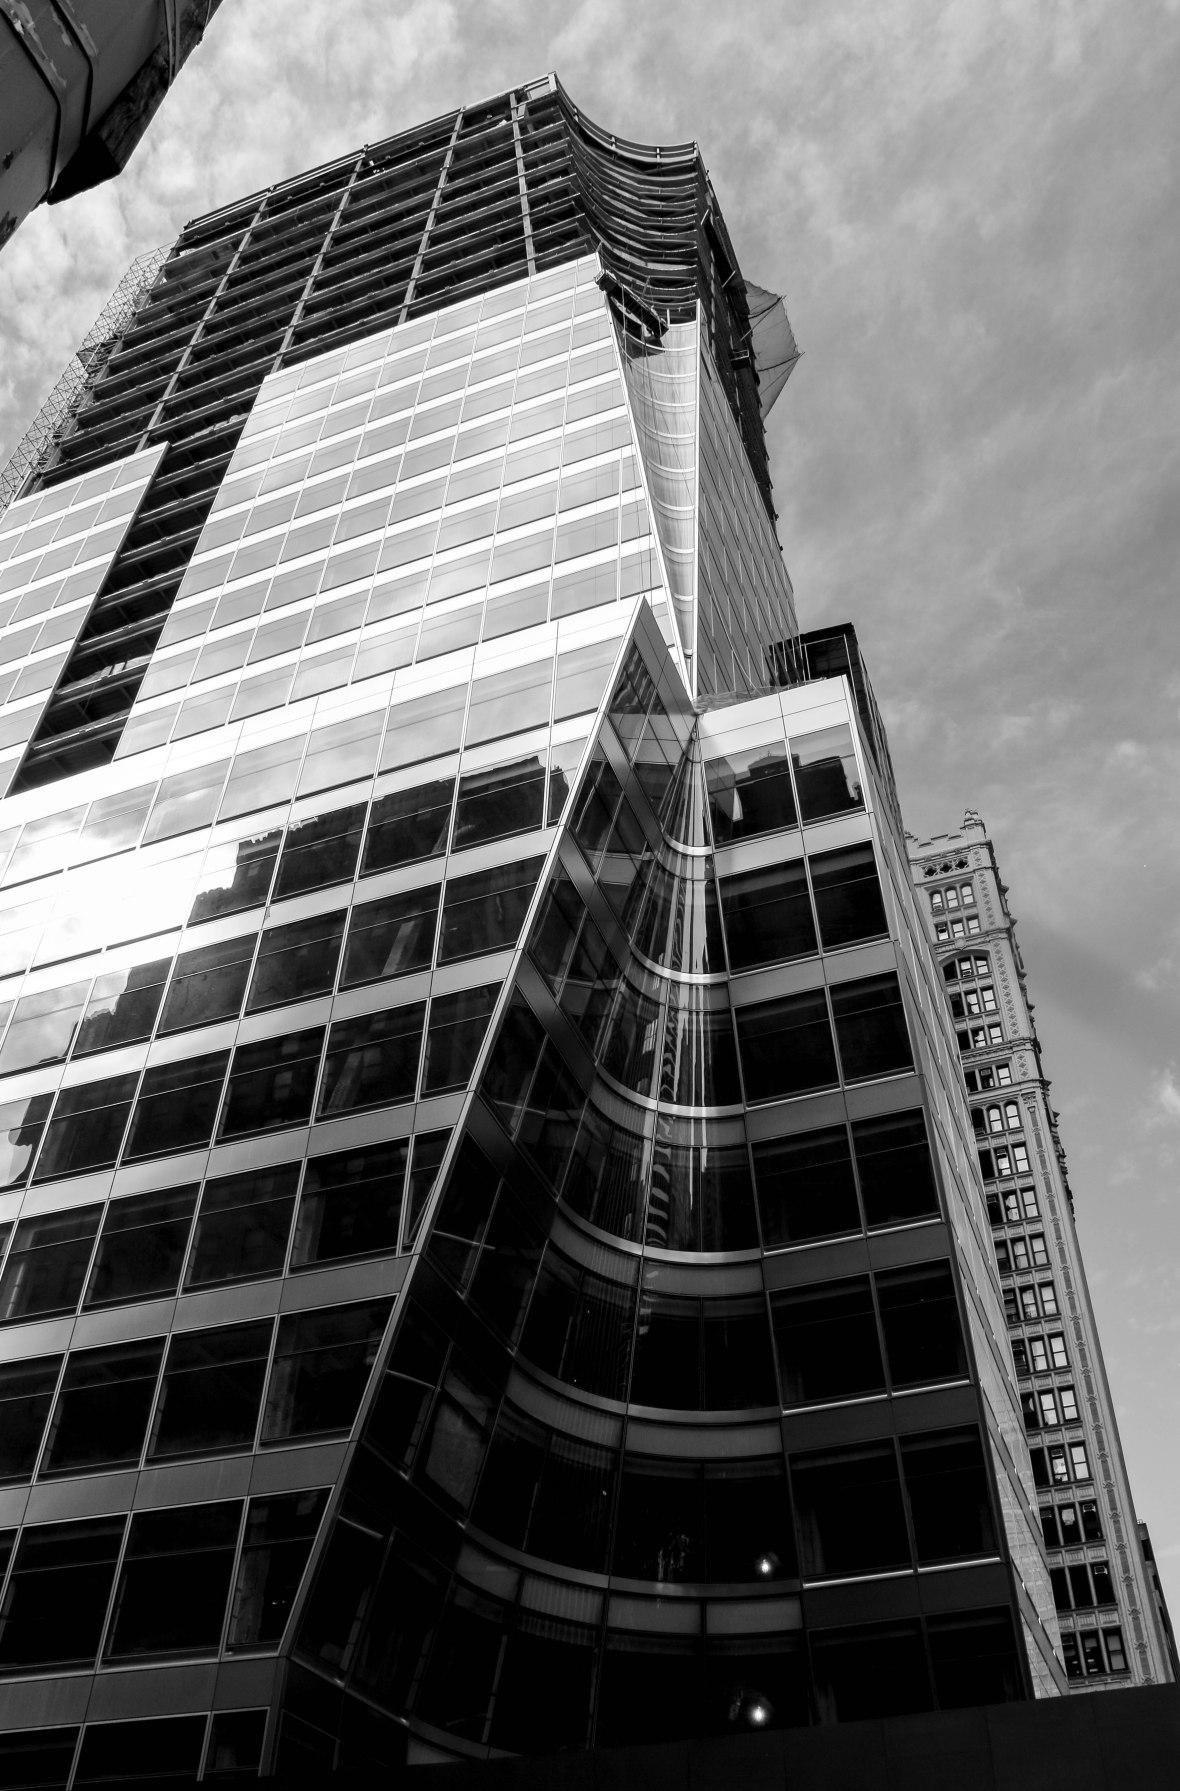 Black & White Portrait: NYC Buildings Architectural Design